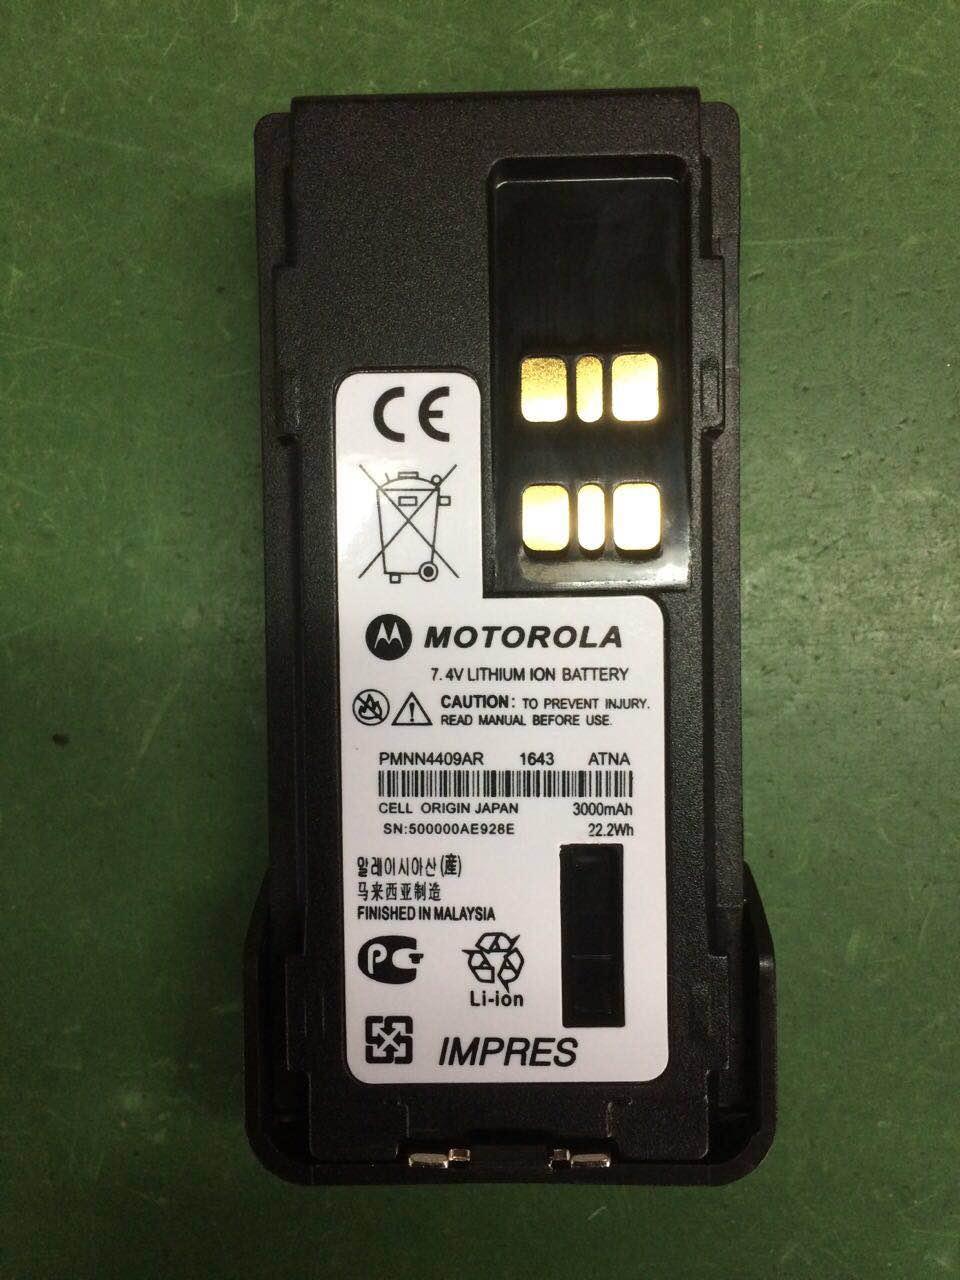 15 pz Batteria per Motorola radiostation DP4801 Ex VHF, DP4801 Ex UHF, DP4401 Ex VHF, DP4401 Ex UHF walkie talkie radio